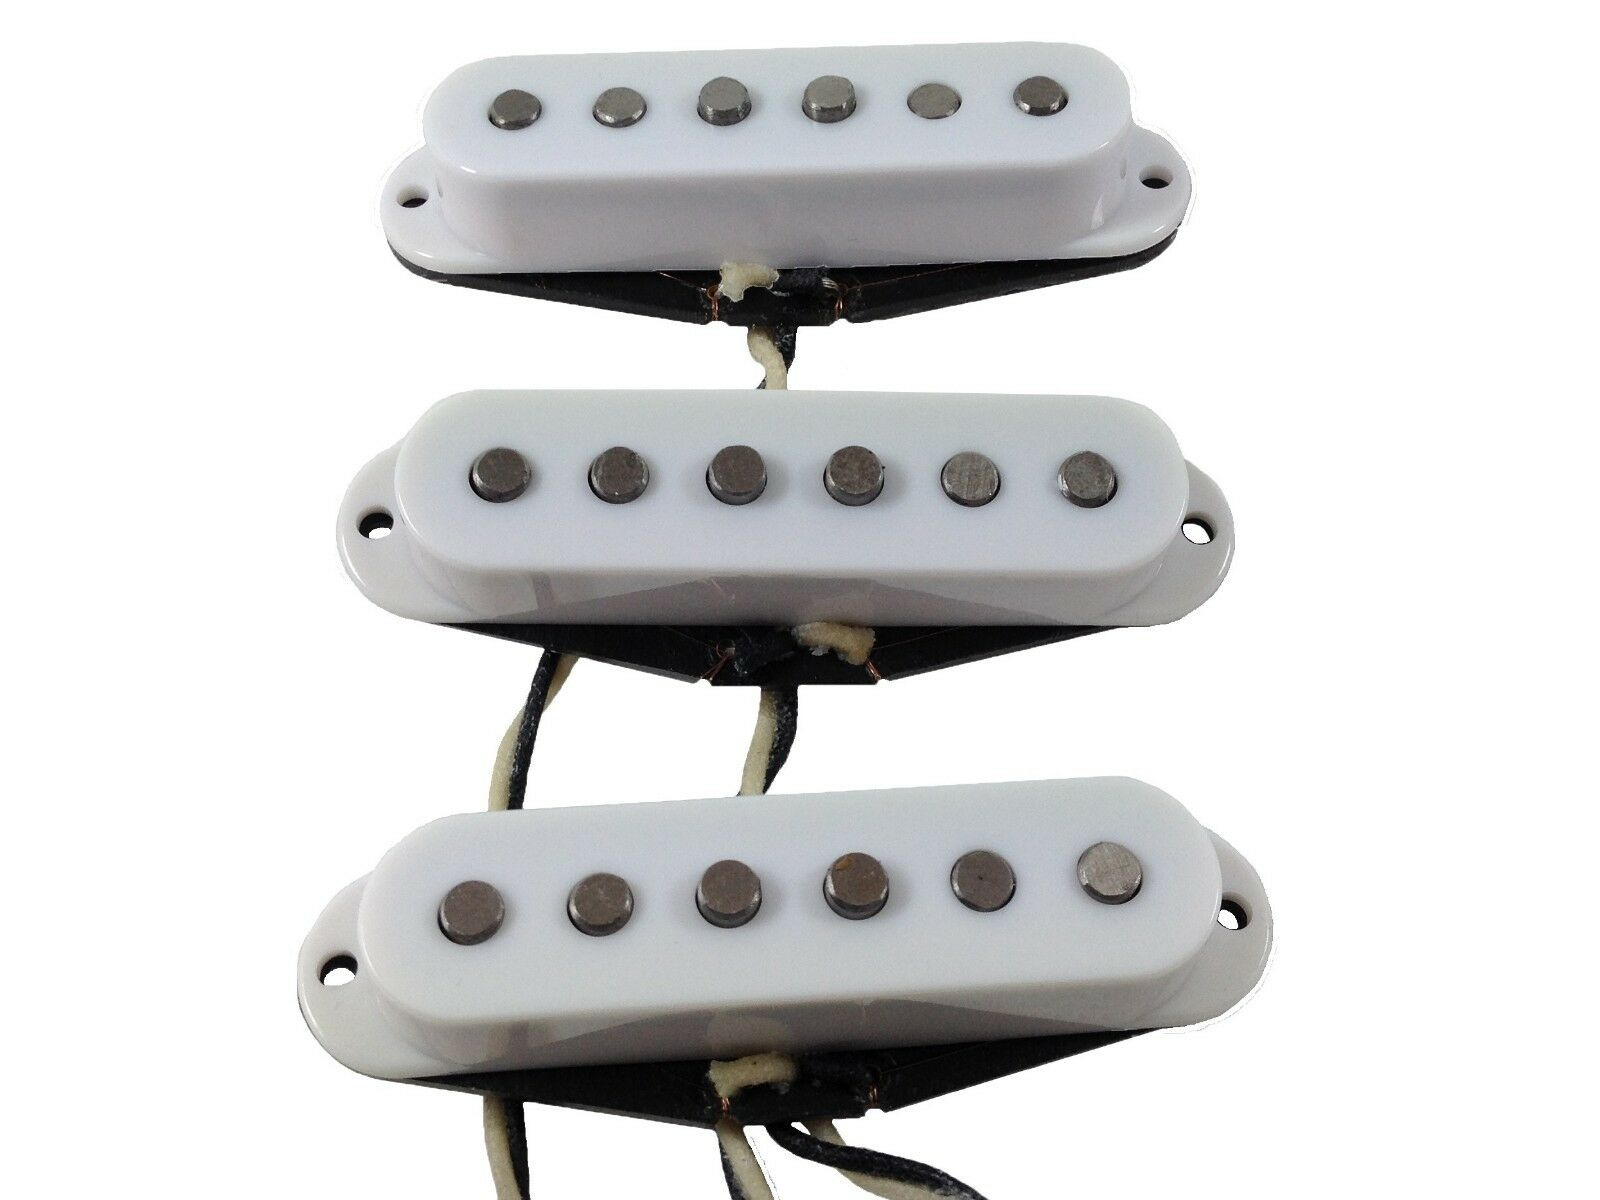 Alegree 'Texan Hailstorm' handwound Stratocaster single coils. single or set